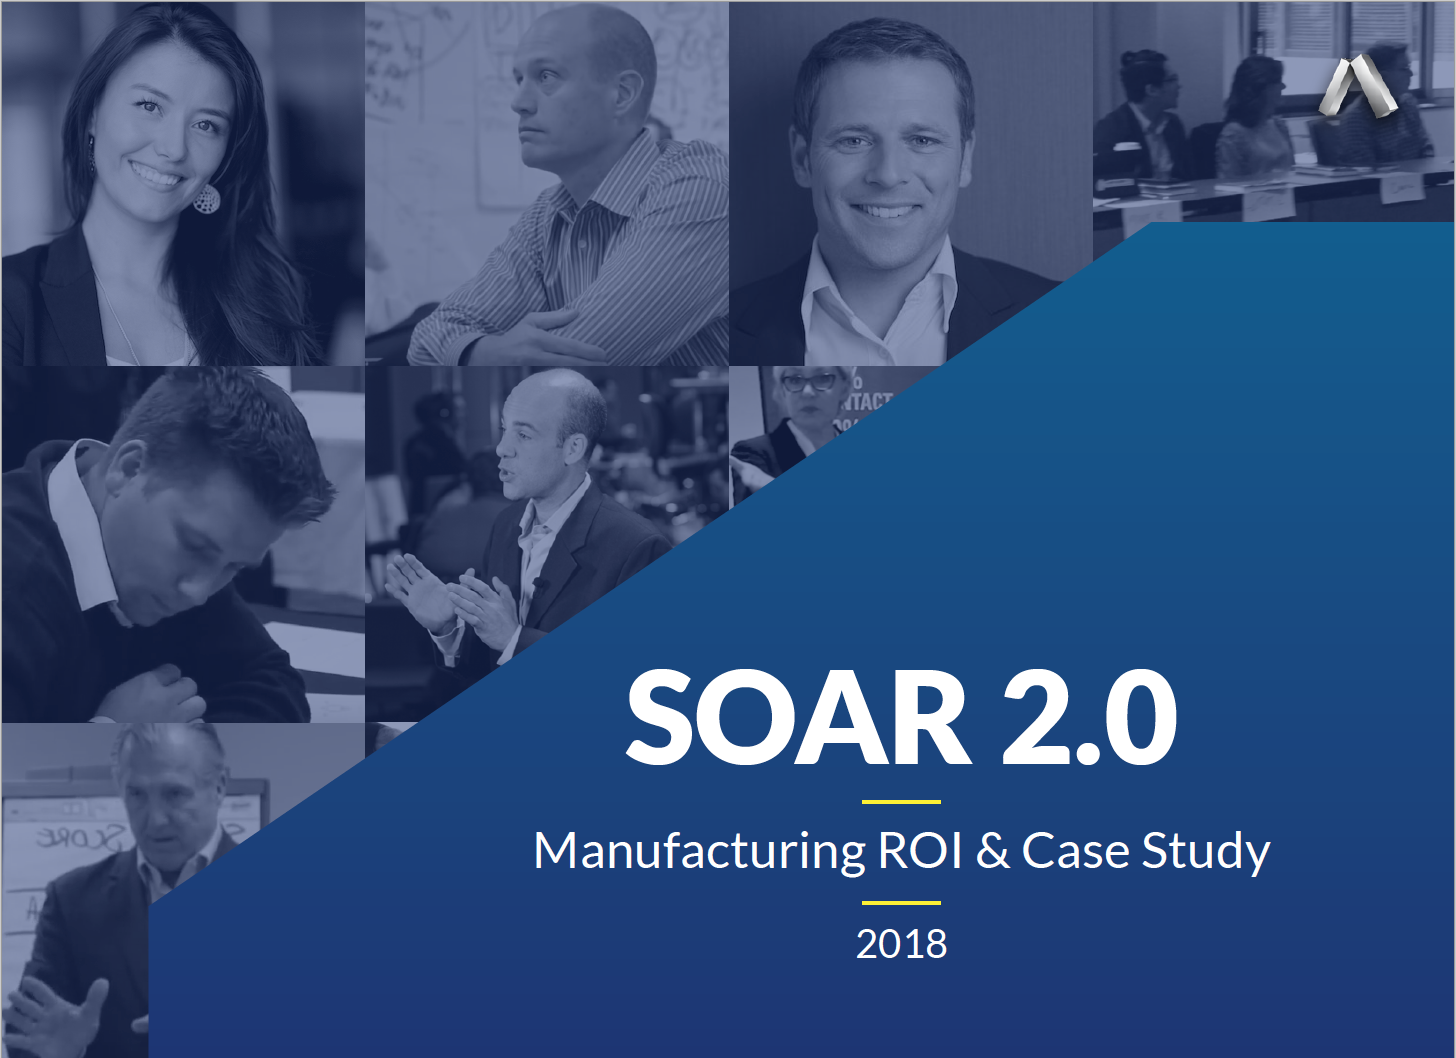 dialexis ebook roi case study 2017 manufacturing